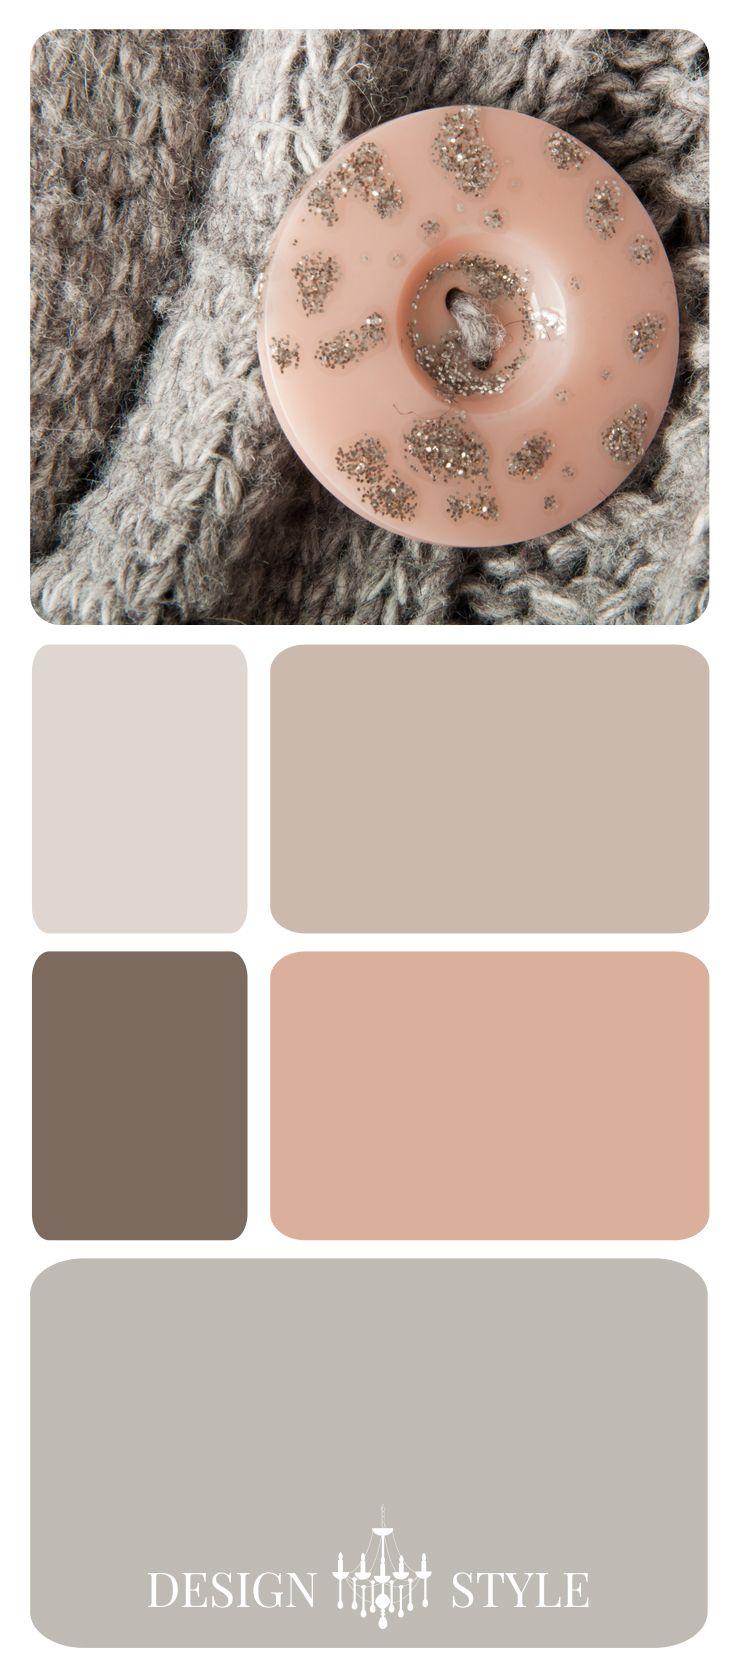 Blush Pink And Gray Color Inspiration Palette Design Style Living Room Decor Colors Apartment Color Schemes Bedroom Color Schemes